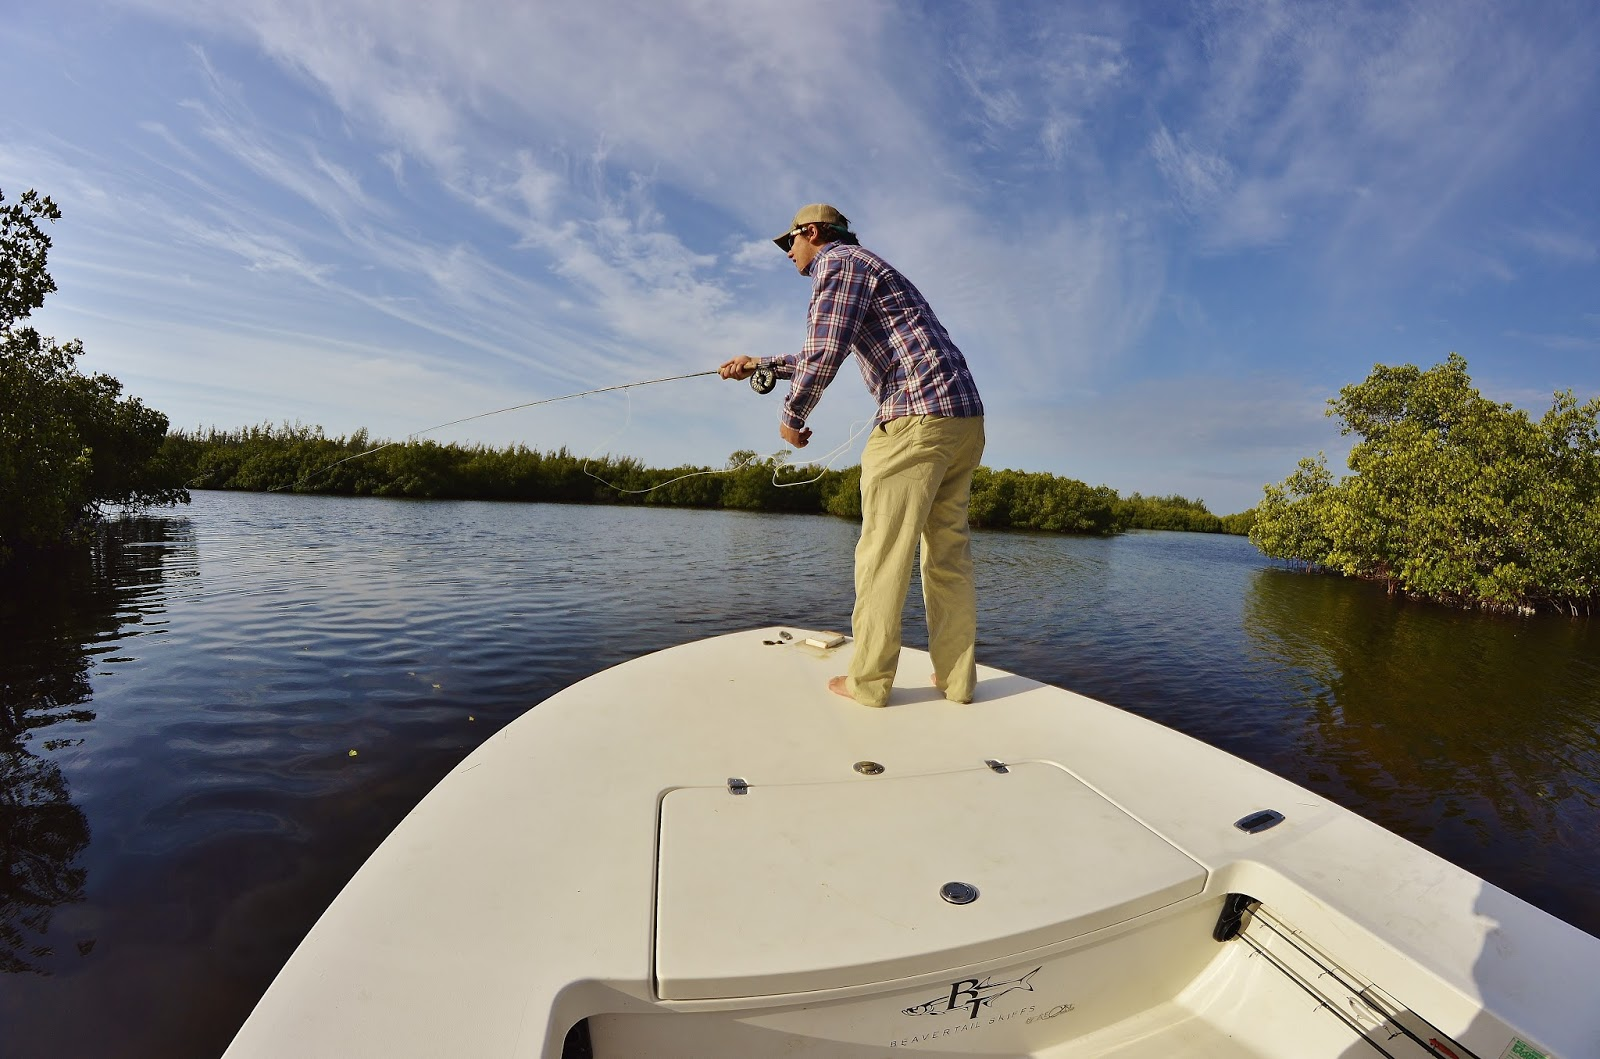 The pine island angler pine island fly fishing club for Pine island fishing charters